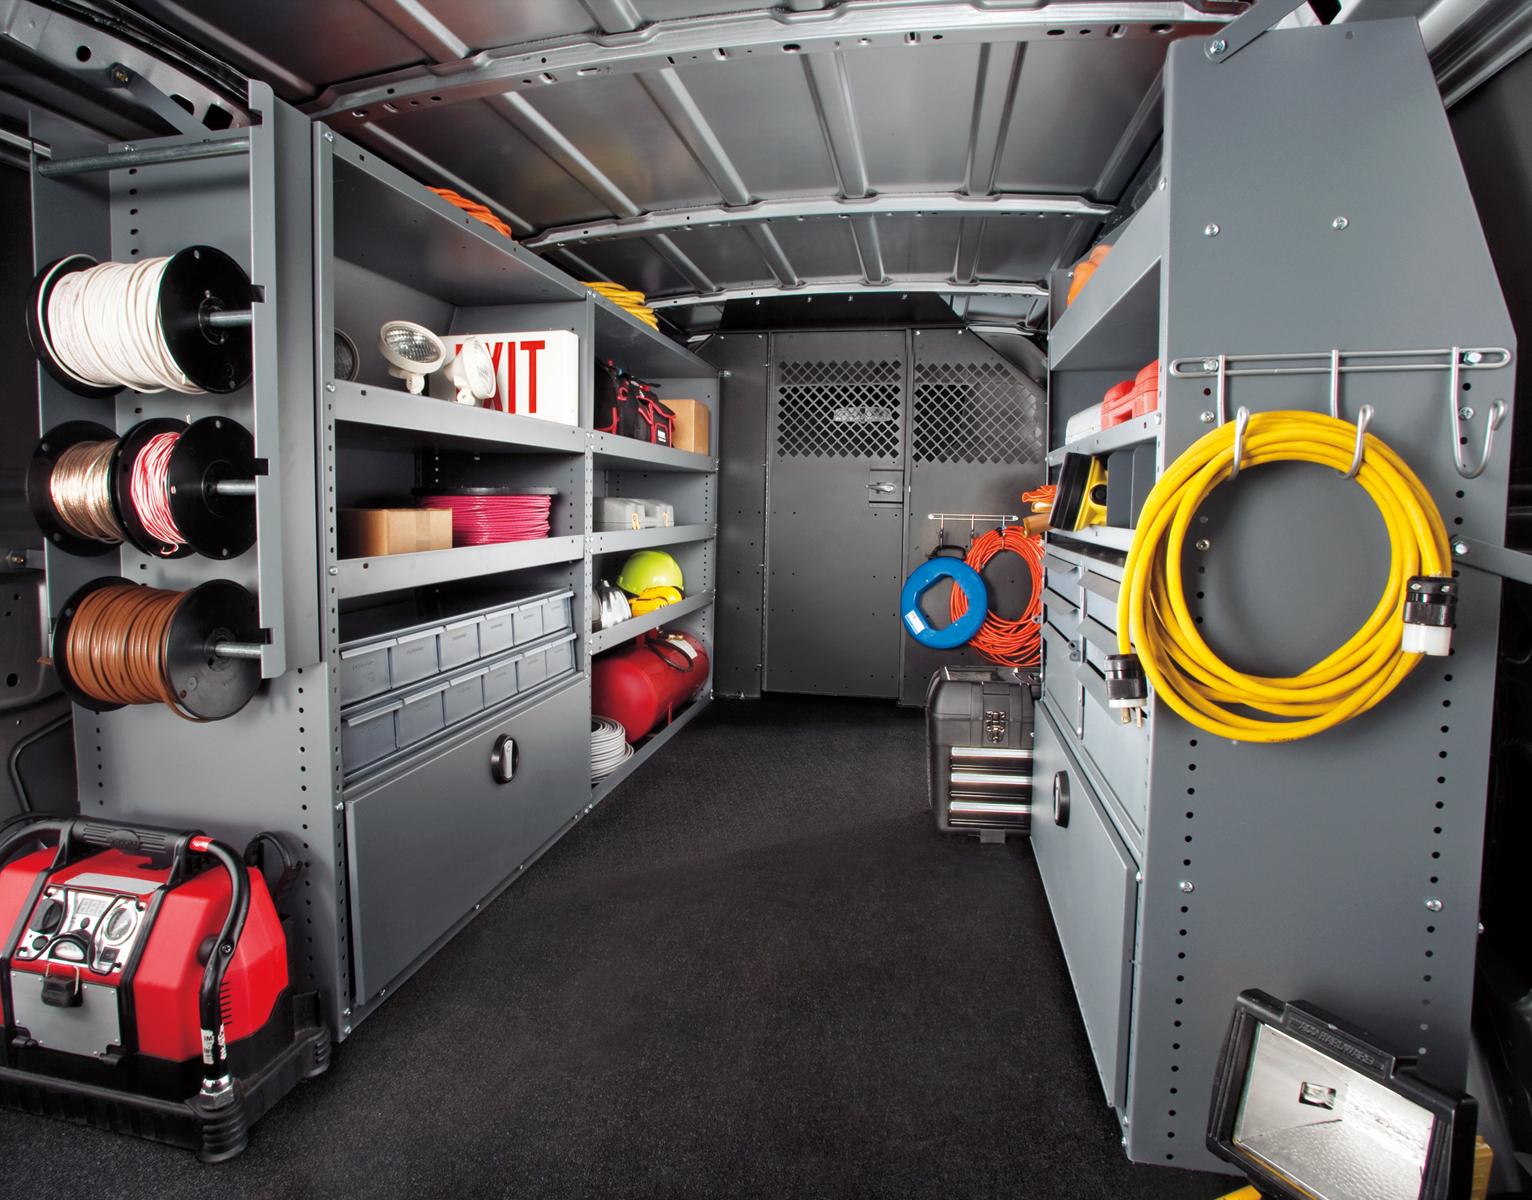 7 Factors to Consider When Upfitting Cargo Vans